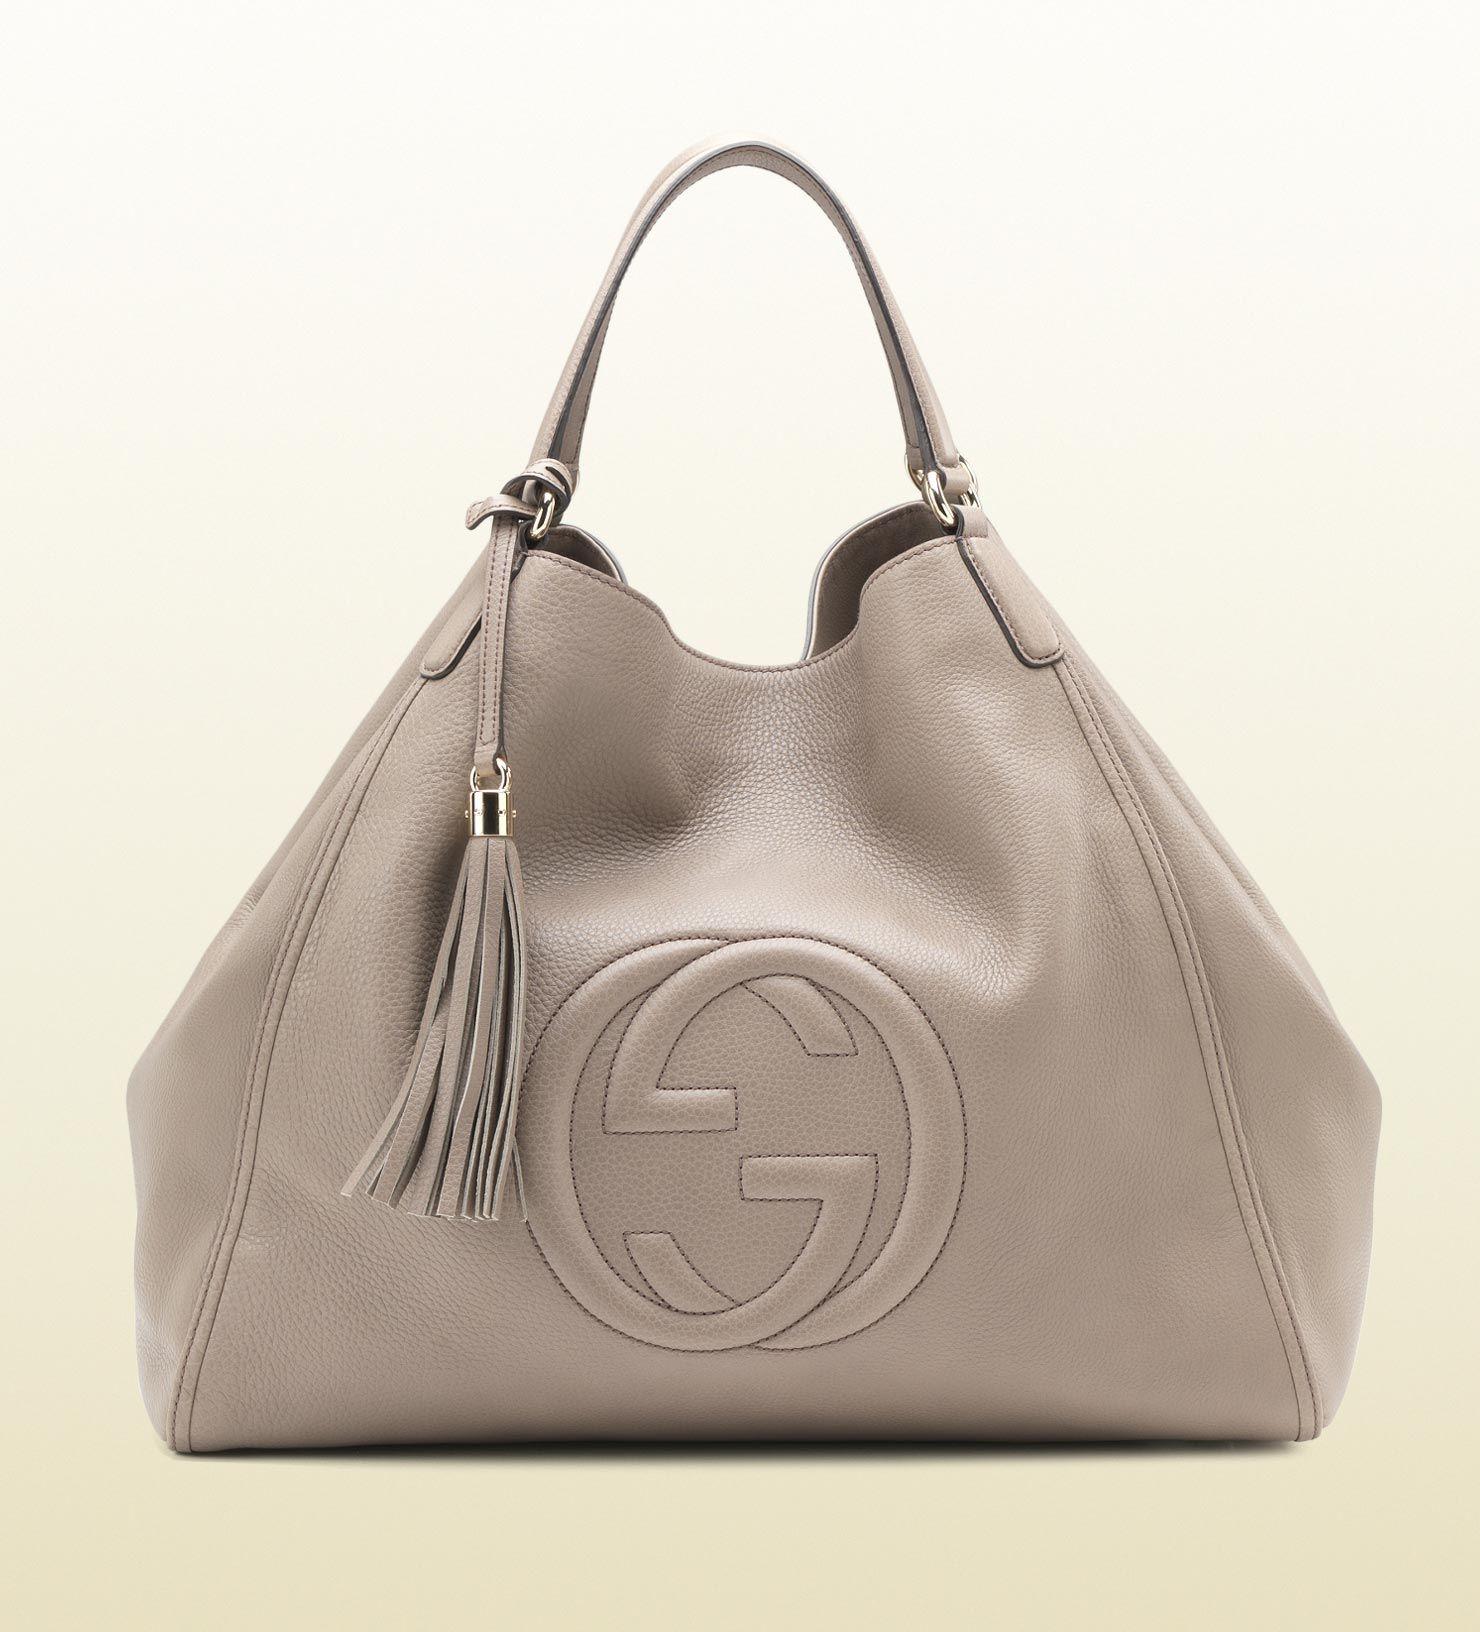 Gucci Soho Shoulder Bag | Page 2 - PurseForum